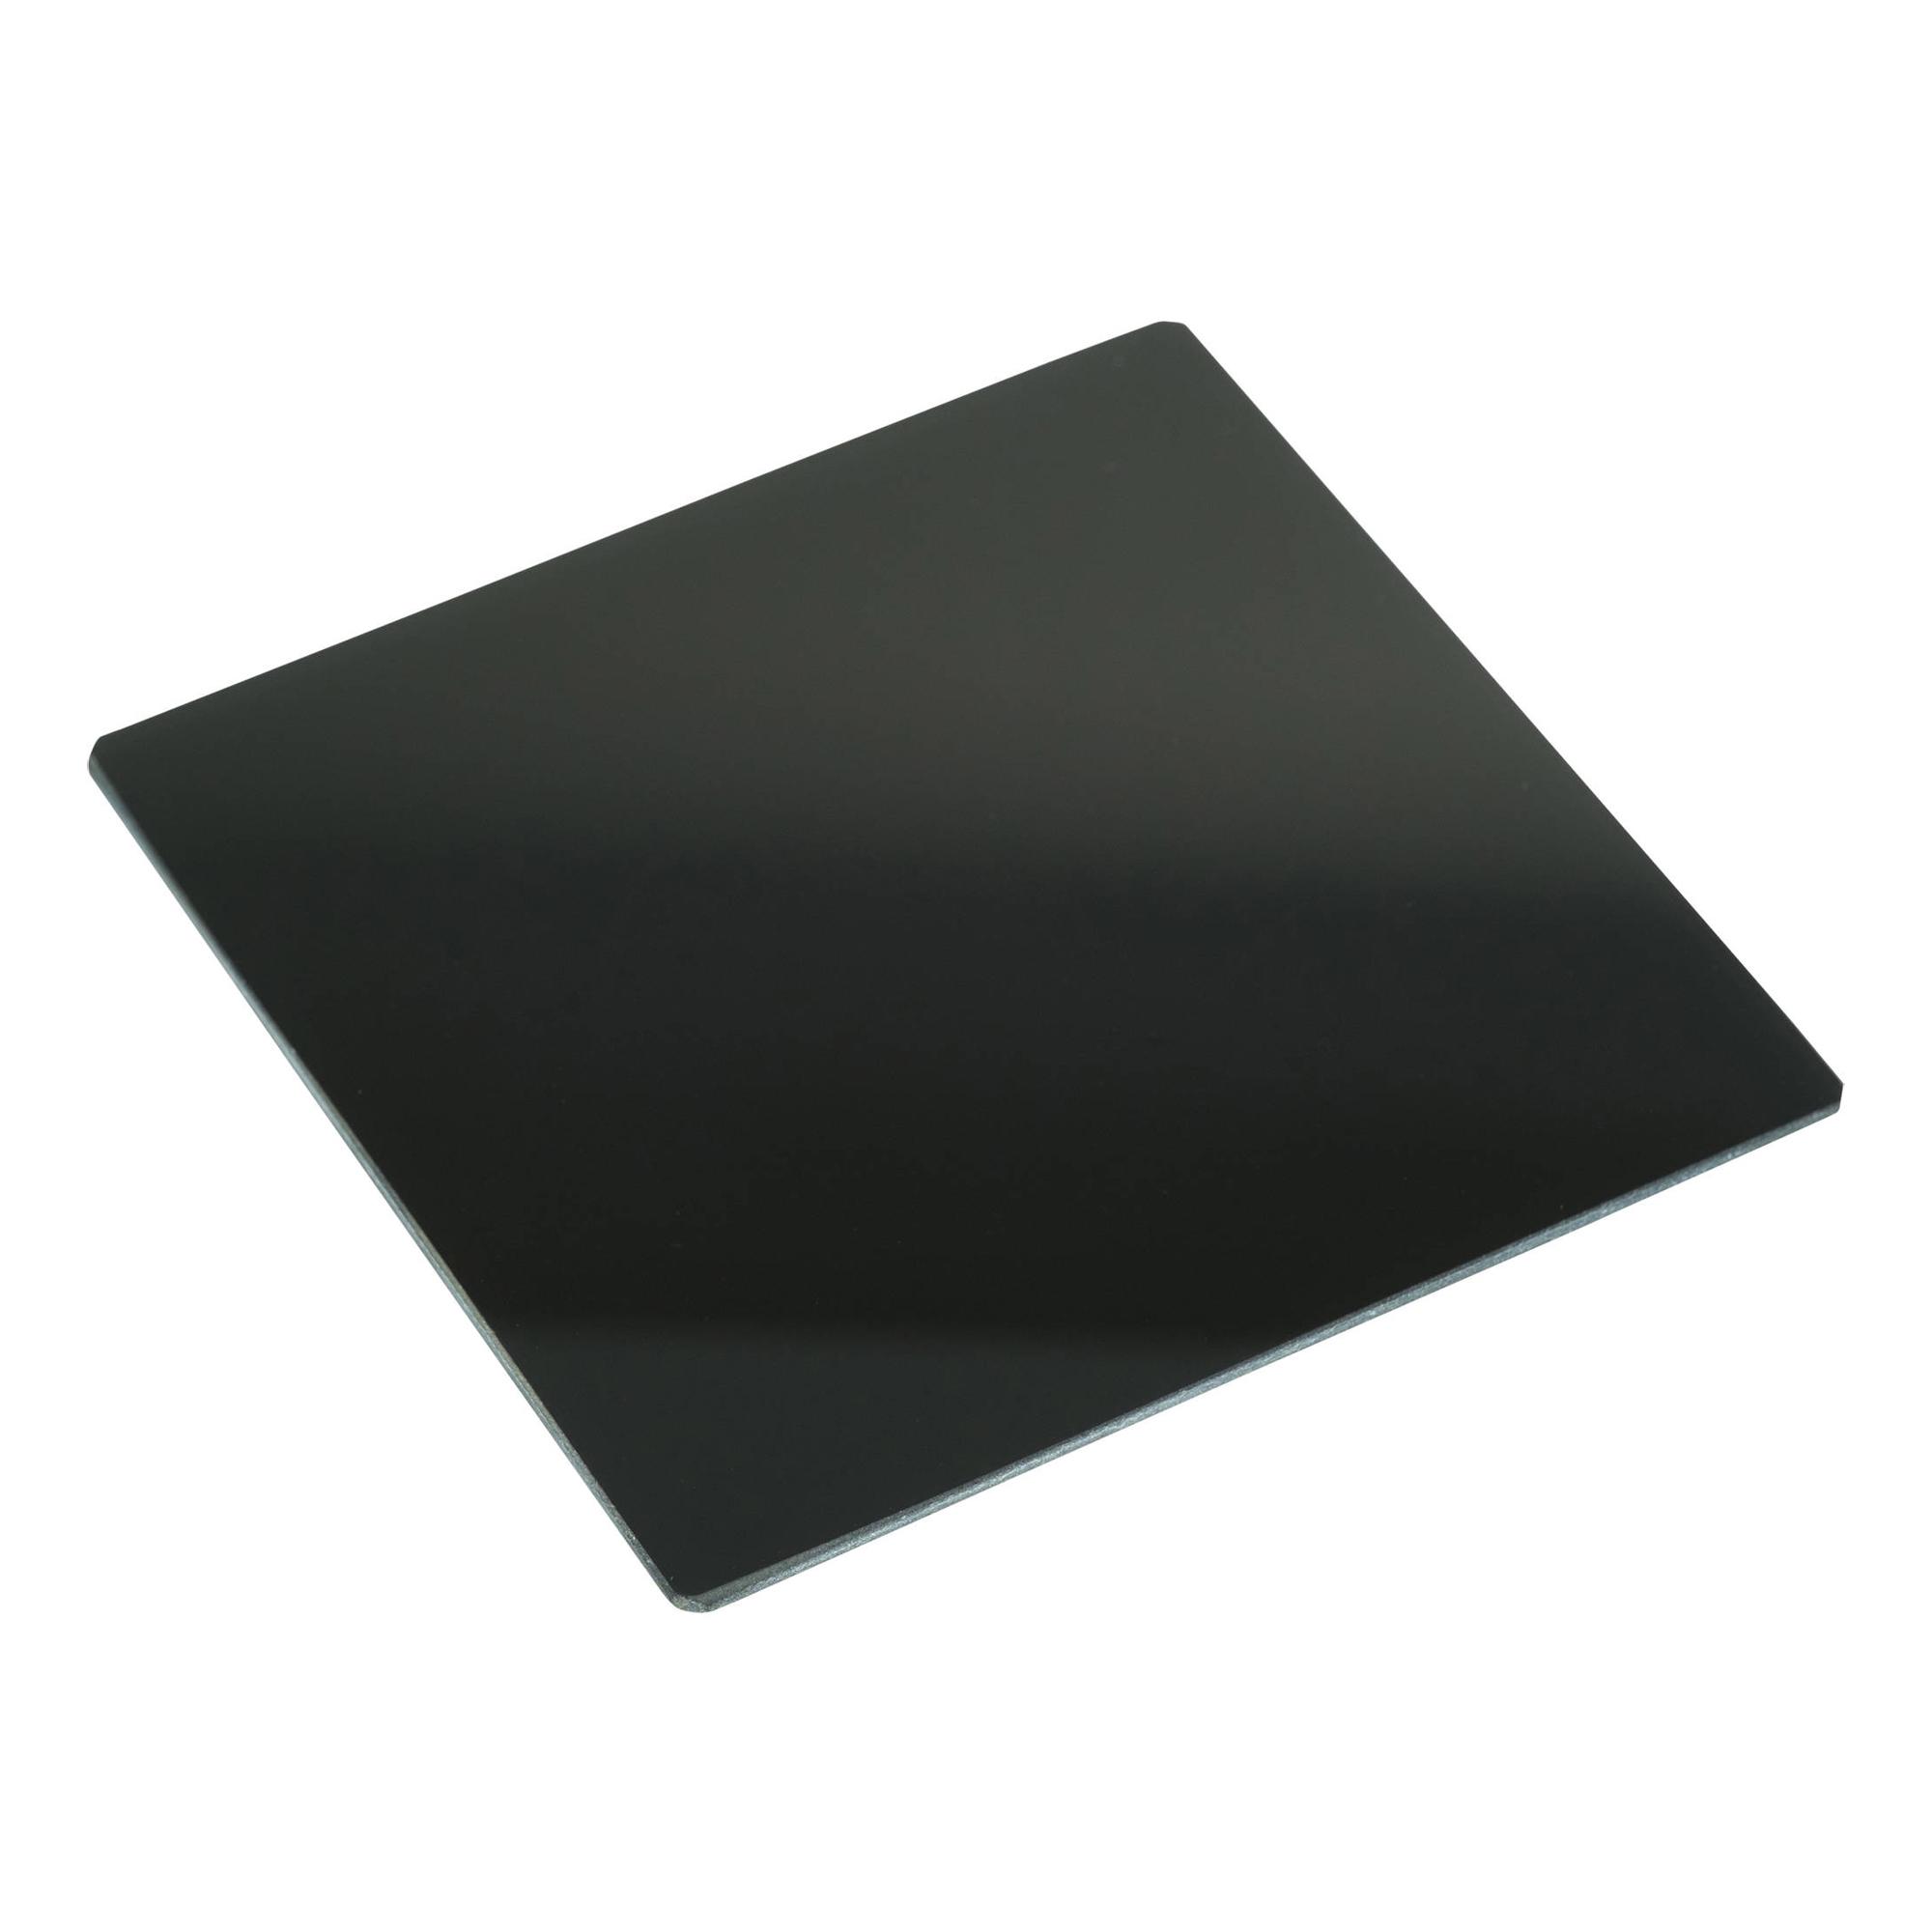 Lee Filters 100 X 100mm Little Stopper 18 Neutral Density Filter 100x150 Graduated Nd Soft Set